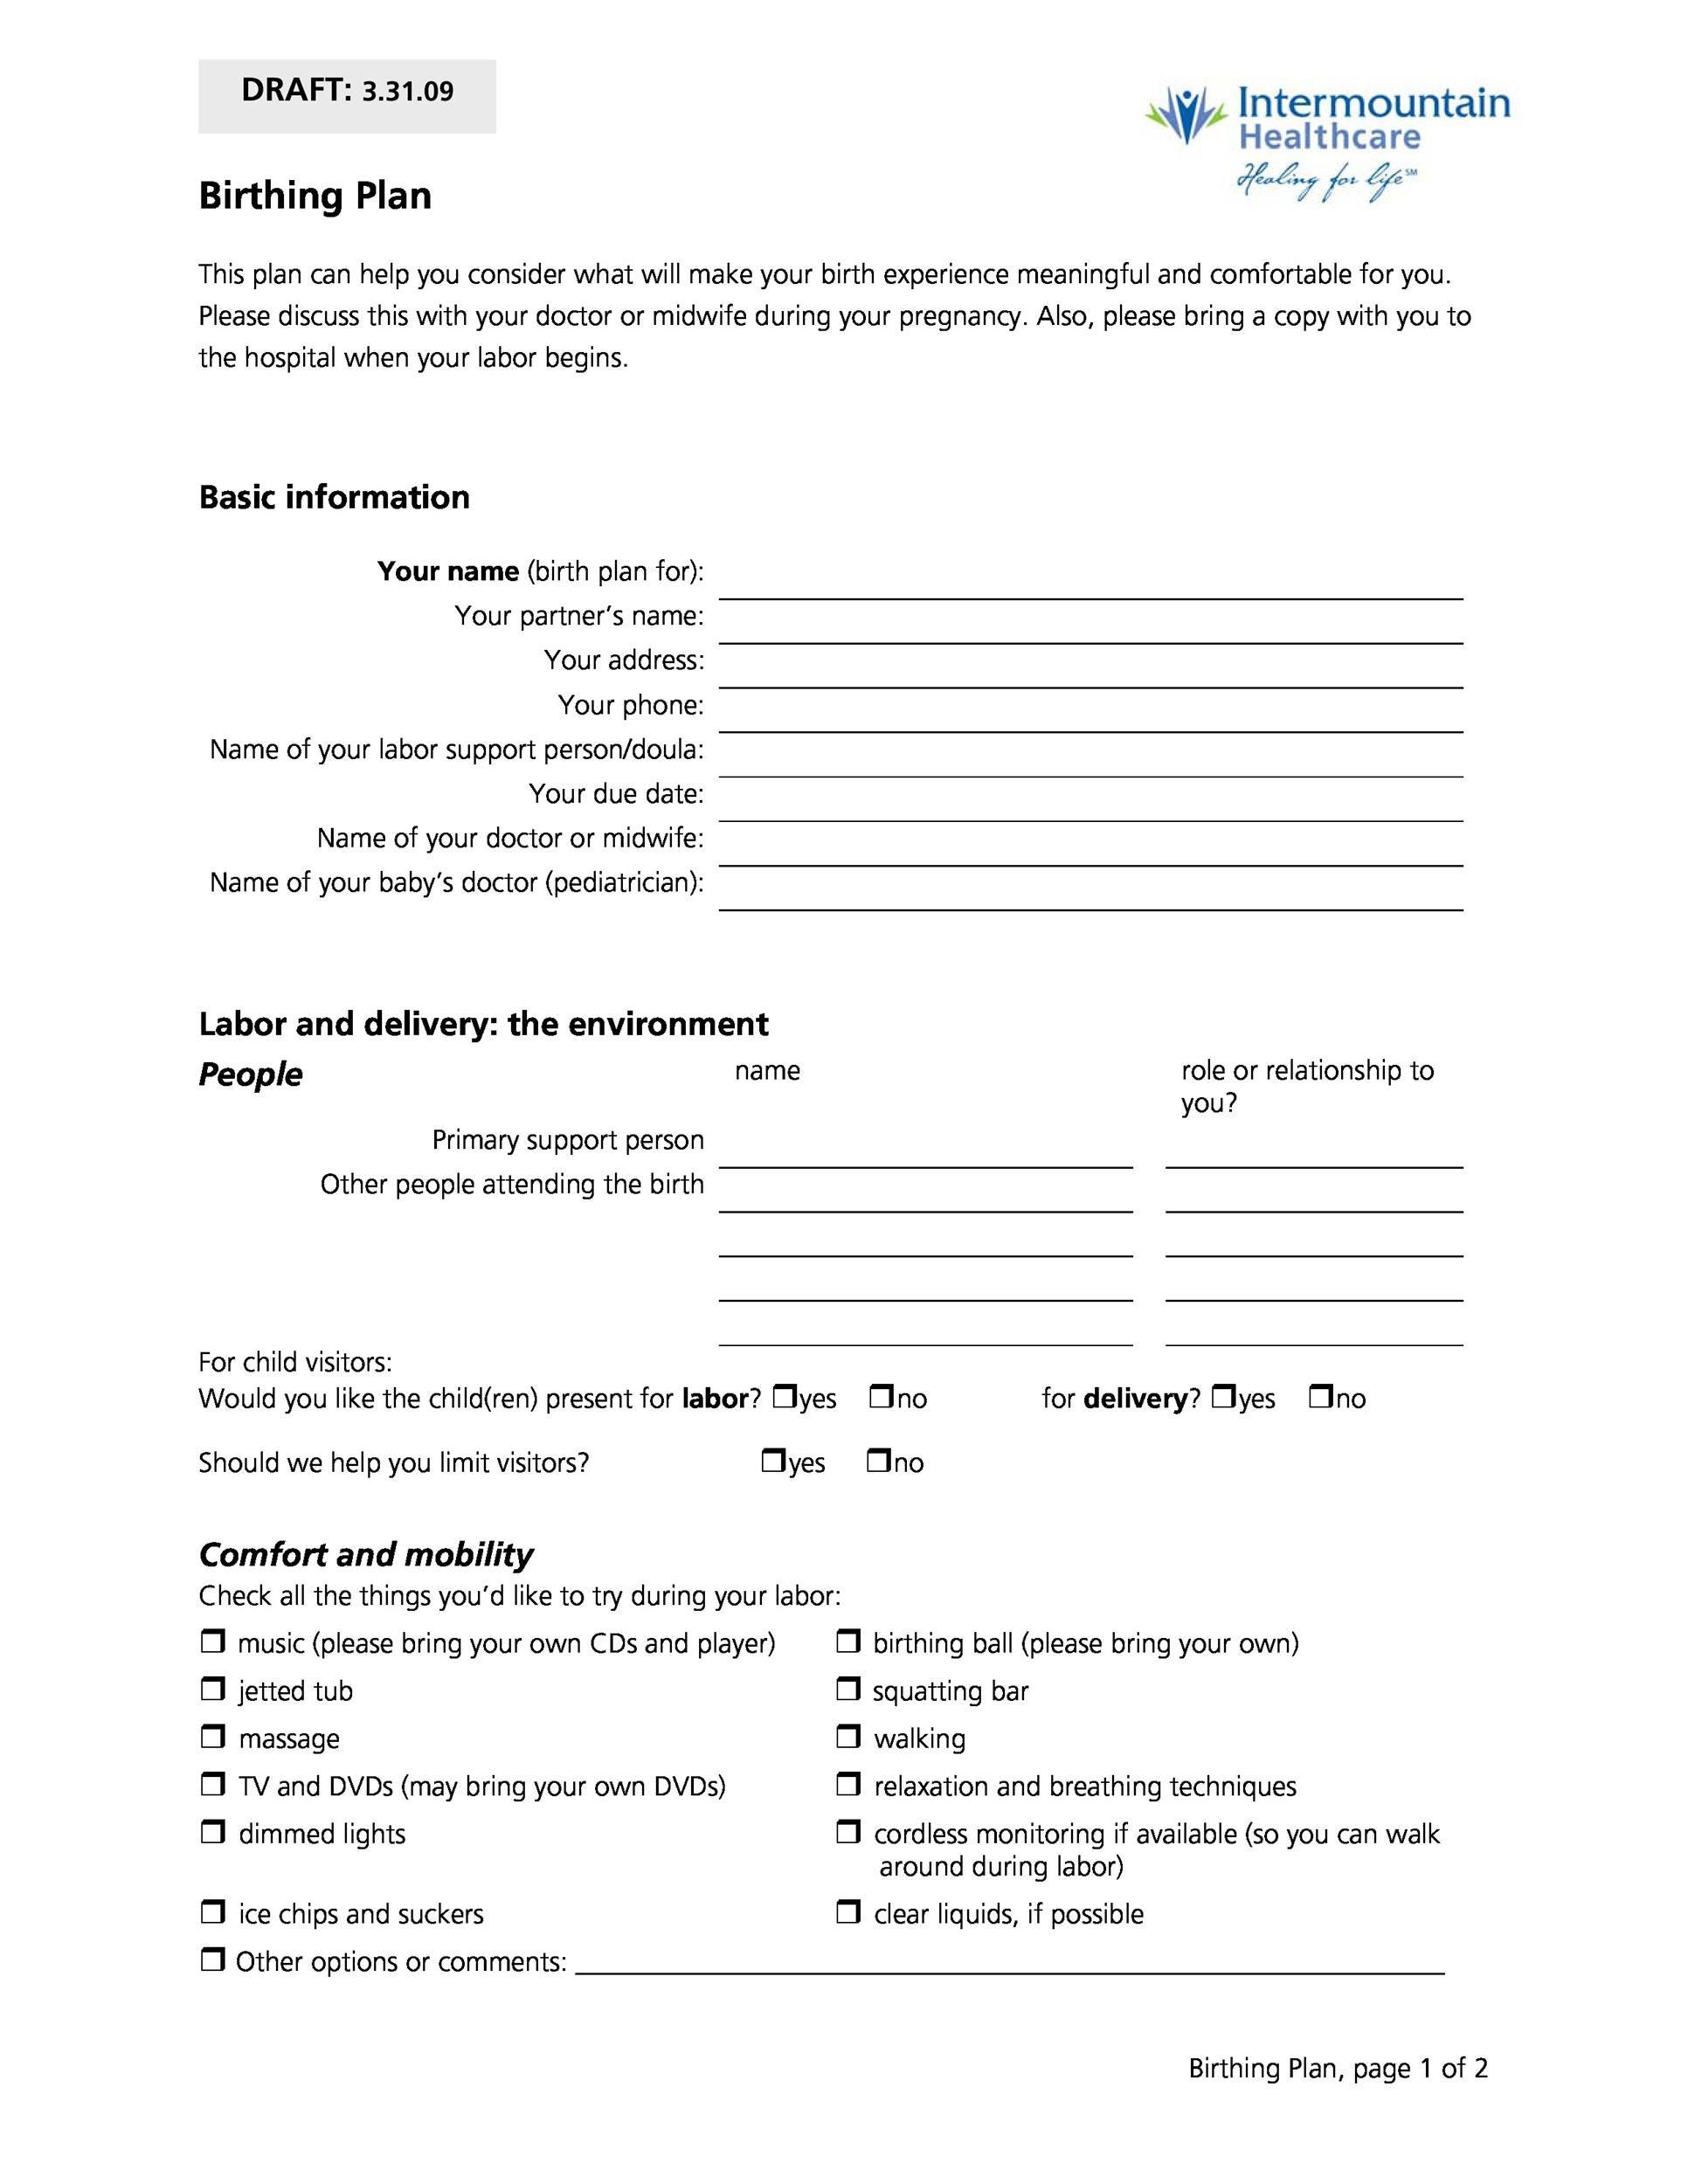 007 Archaicawful Printable Birth Plan Template High Definition  Editable Pdf FreeFull